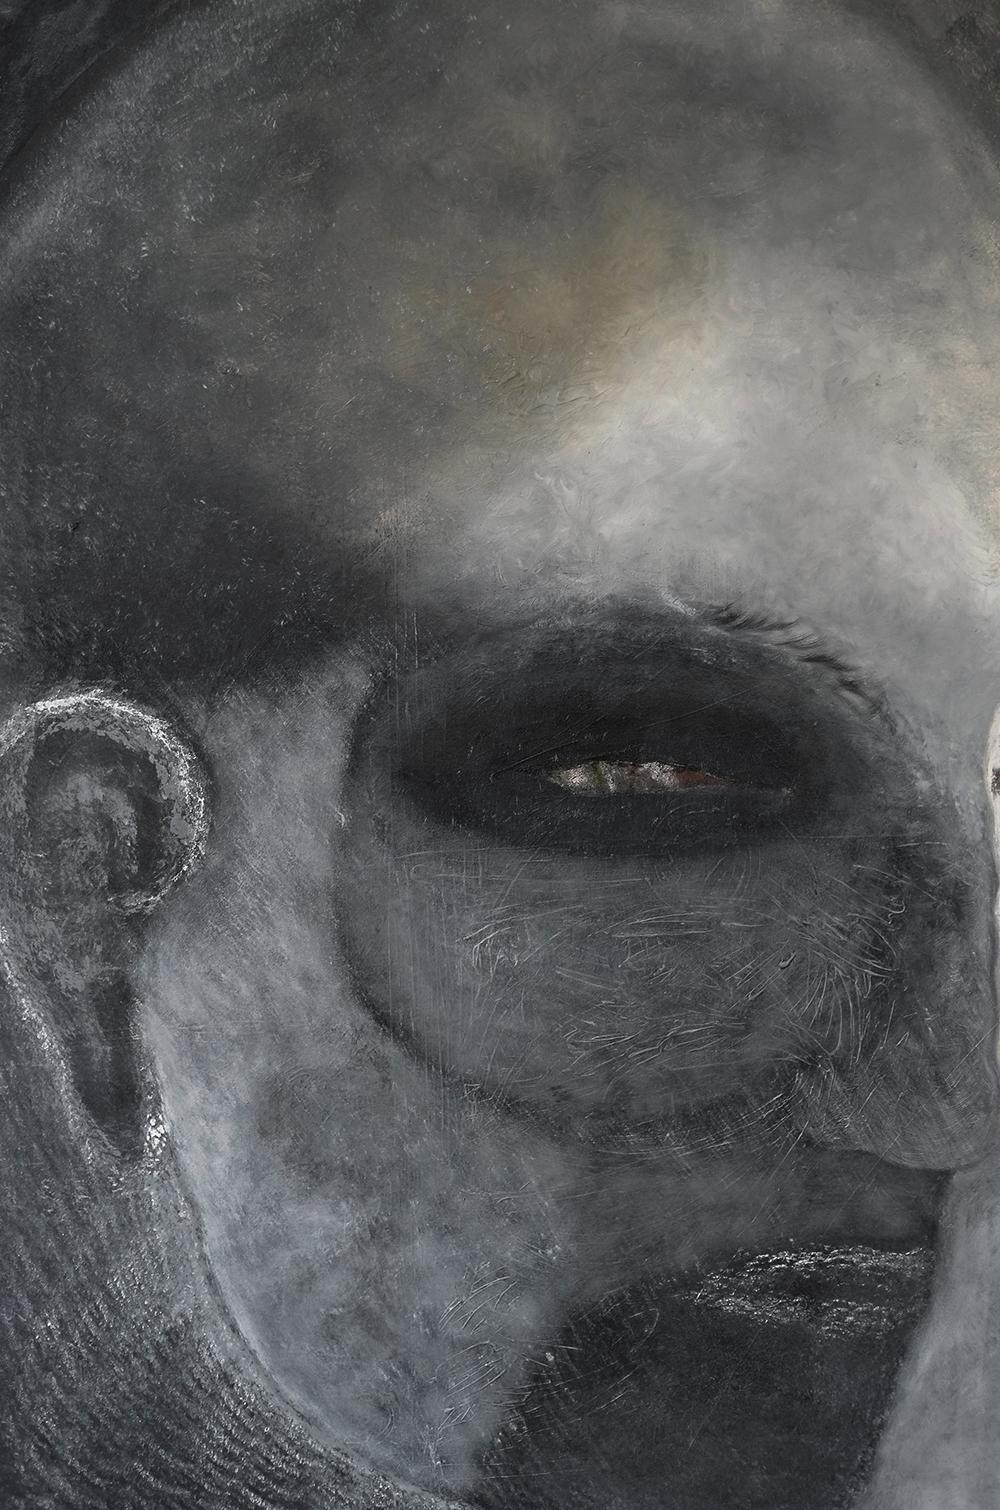 1. S. Derviz, untitled, 195 x 110cm, oil on canvas, 2019.jpg